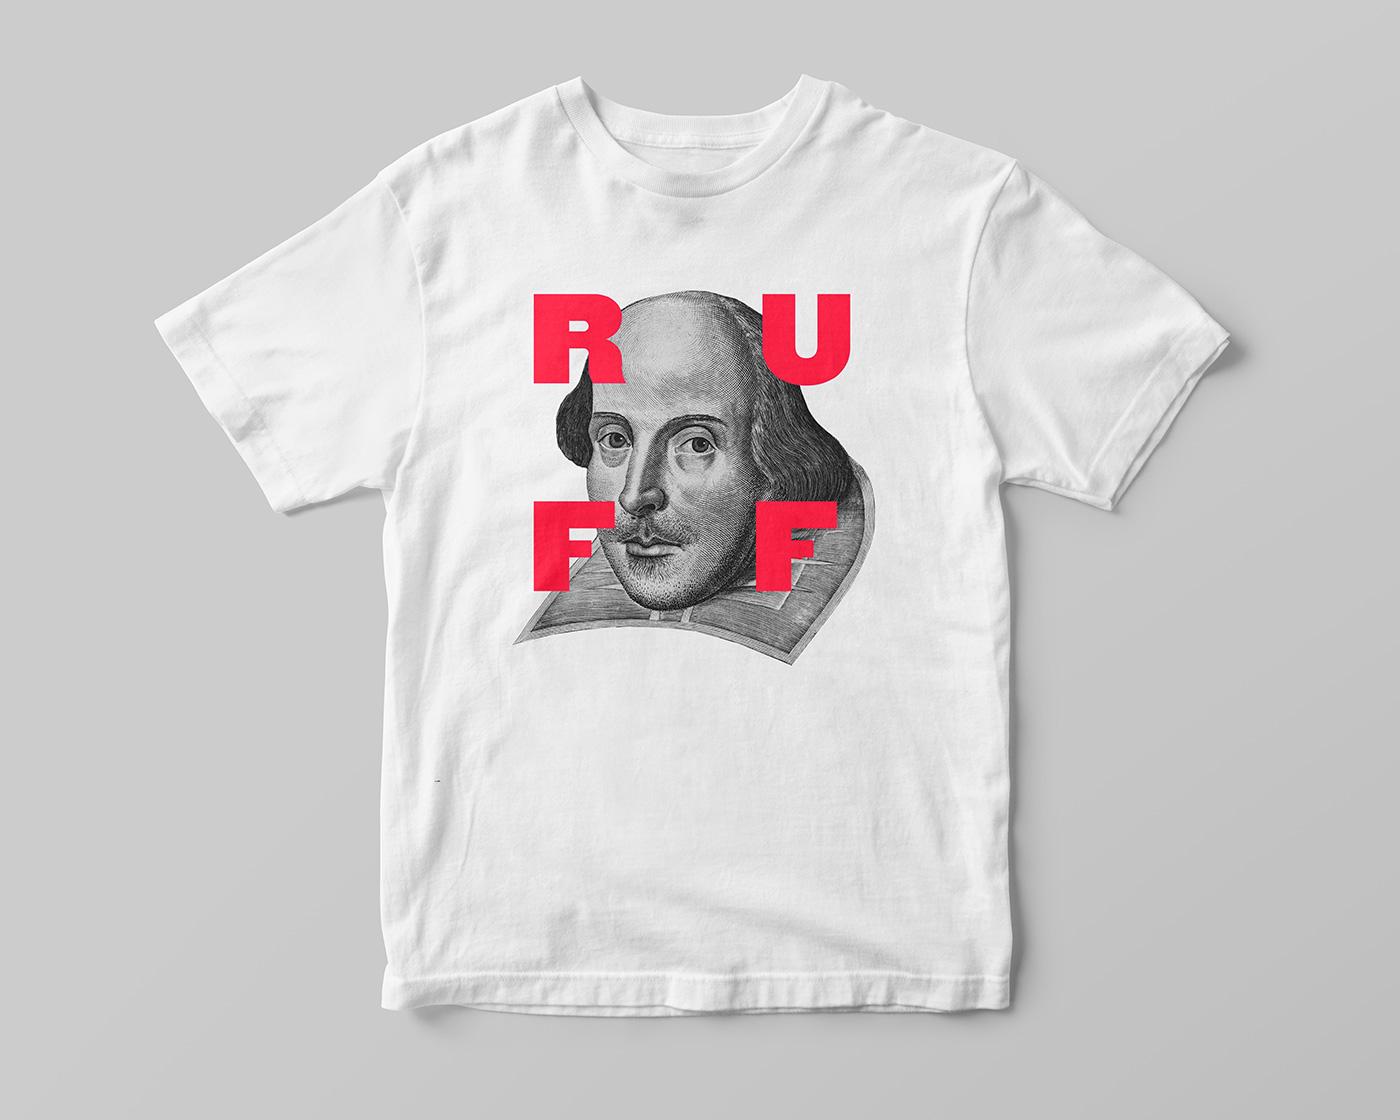 Shakespeare in the Ruff t-shirt